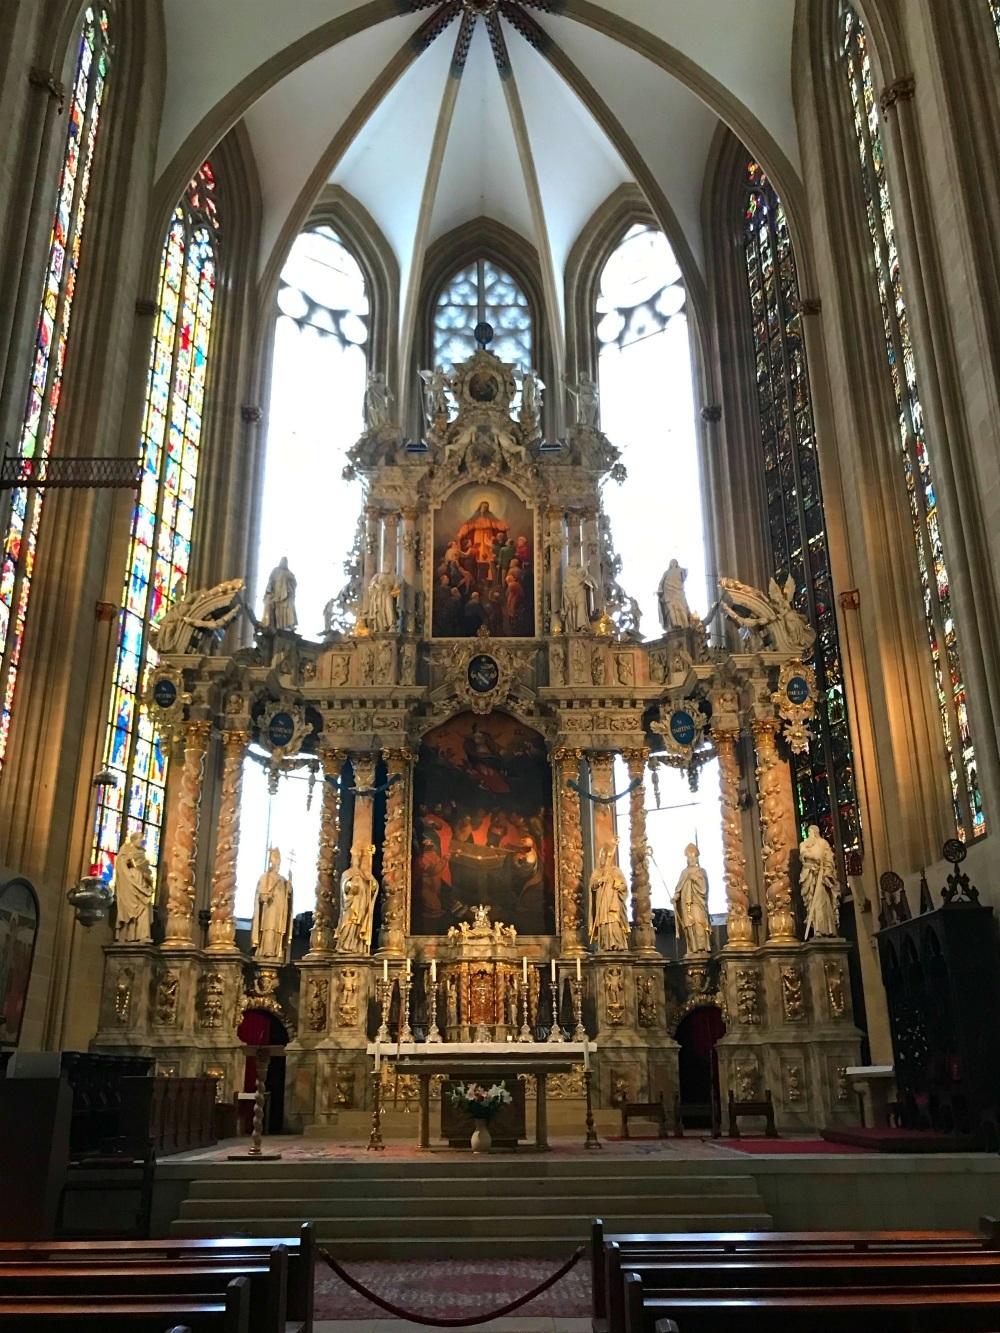 Cathedral in Erfurt Thuringia, Germany Photo Heatheronhertravels.com